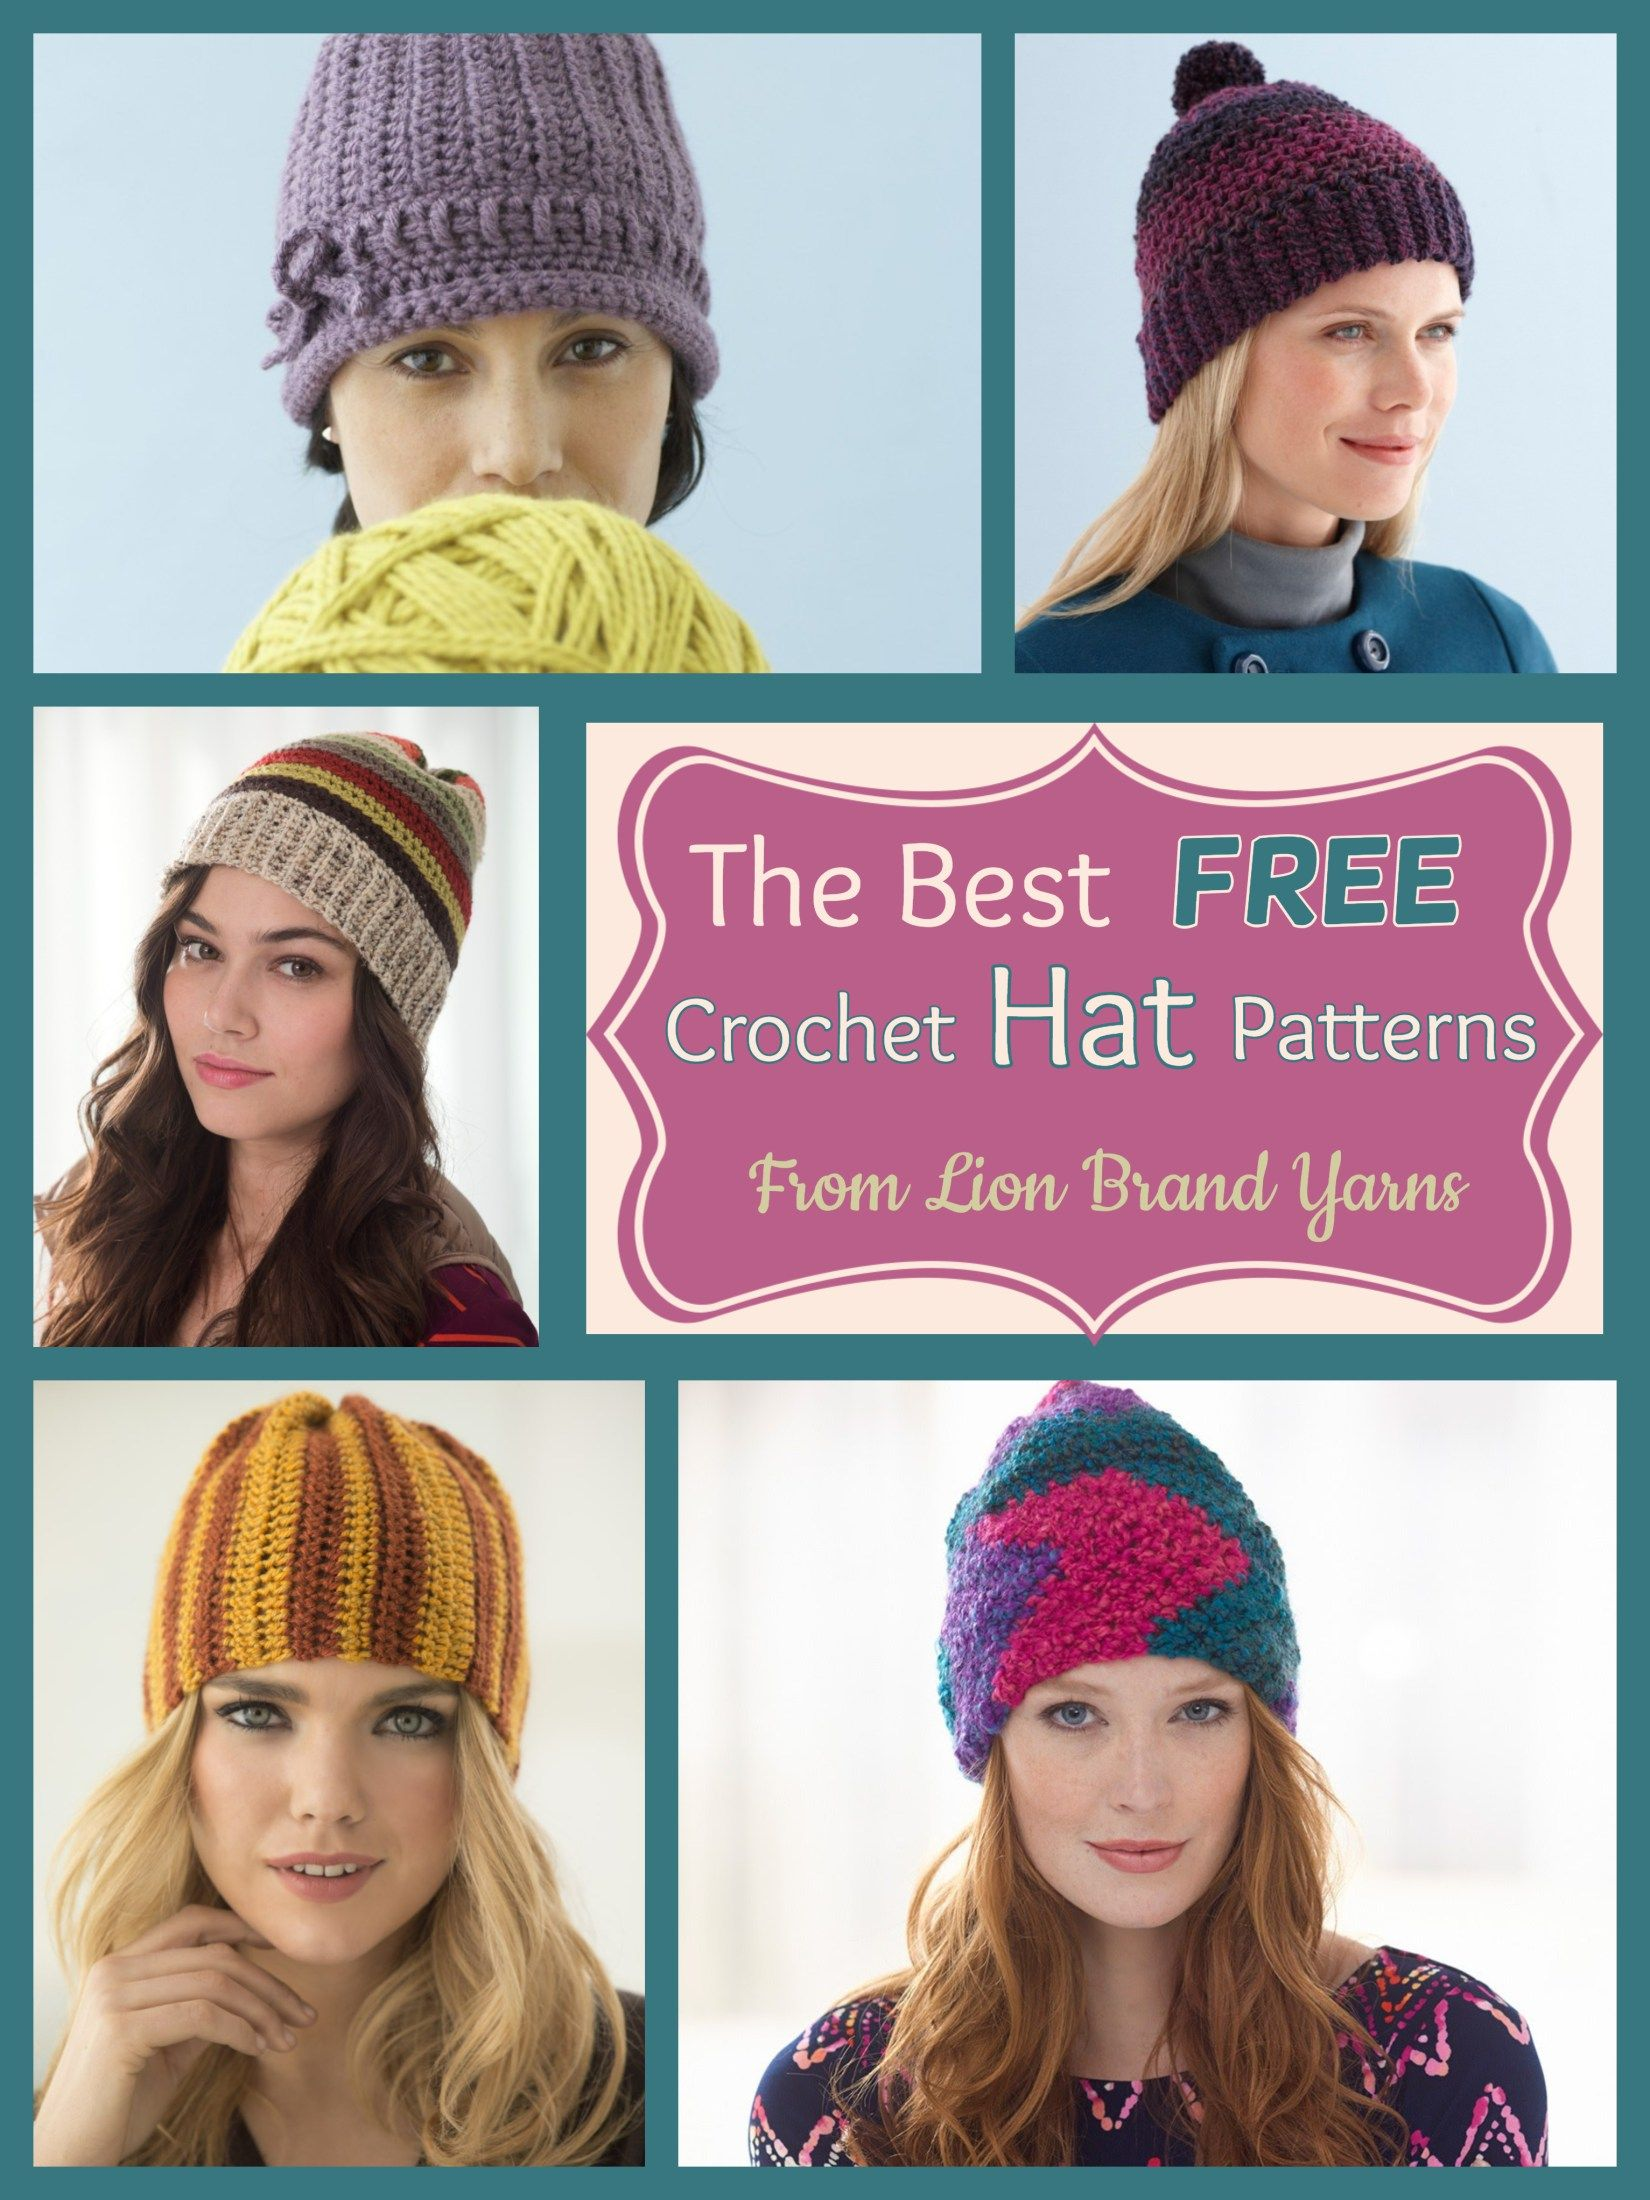 Best Free Crochet Hat Patterns From Lion Brand Yarns Free Crochet